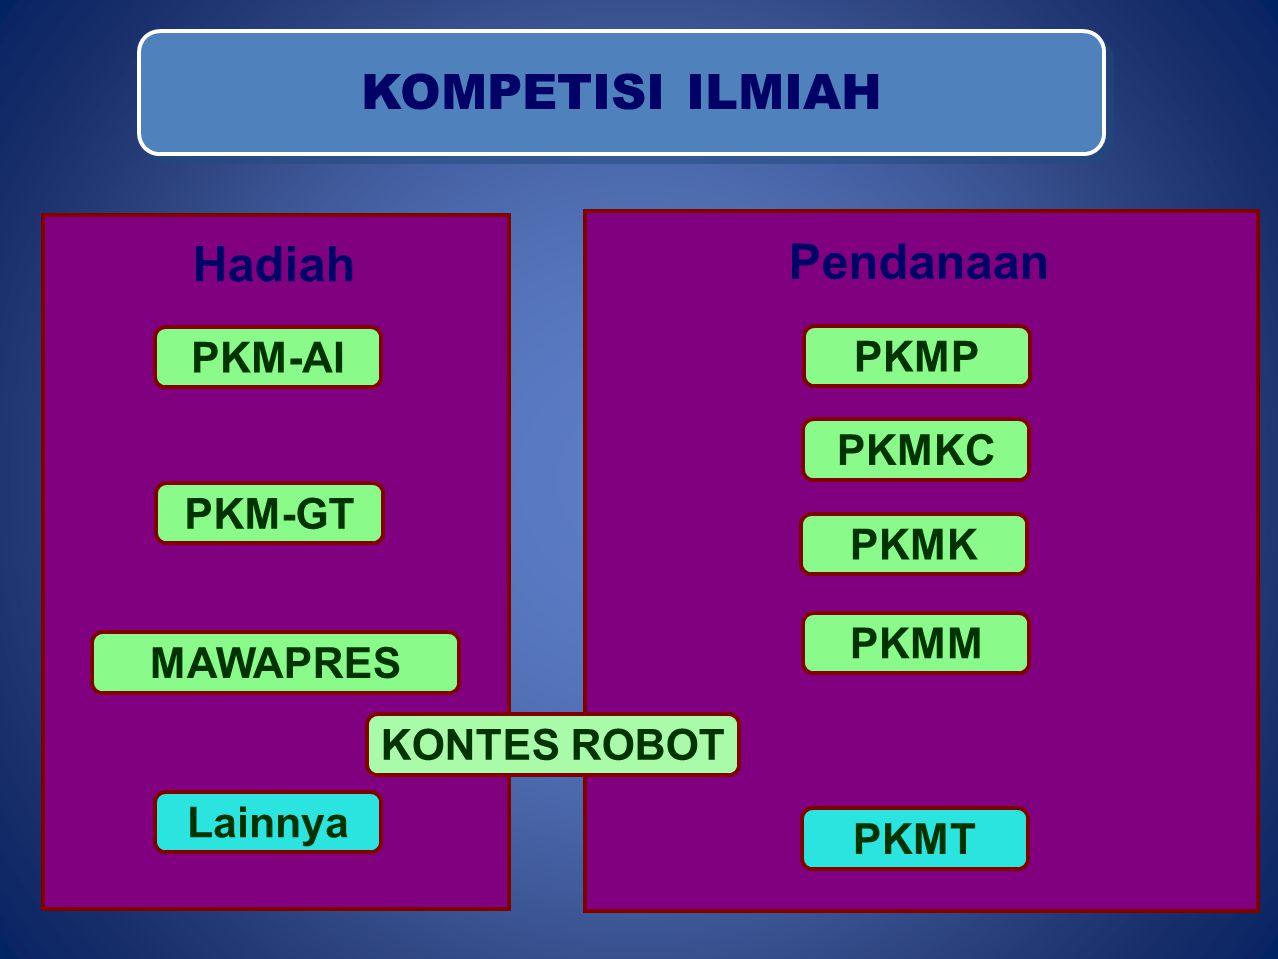 KOMPETISI ILMIAH Pendanaan Hadiah PKM-AI PKMP PKMKC PKM-GT PKMK PKMM